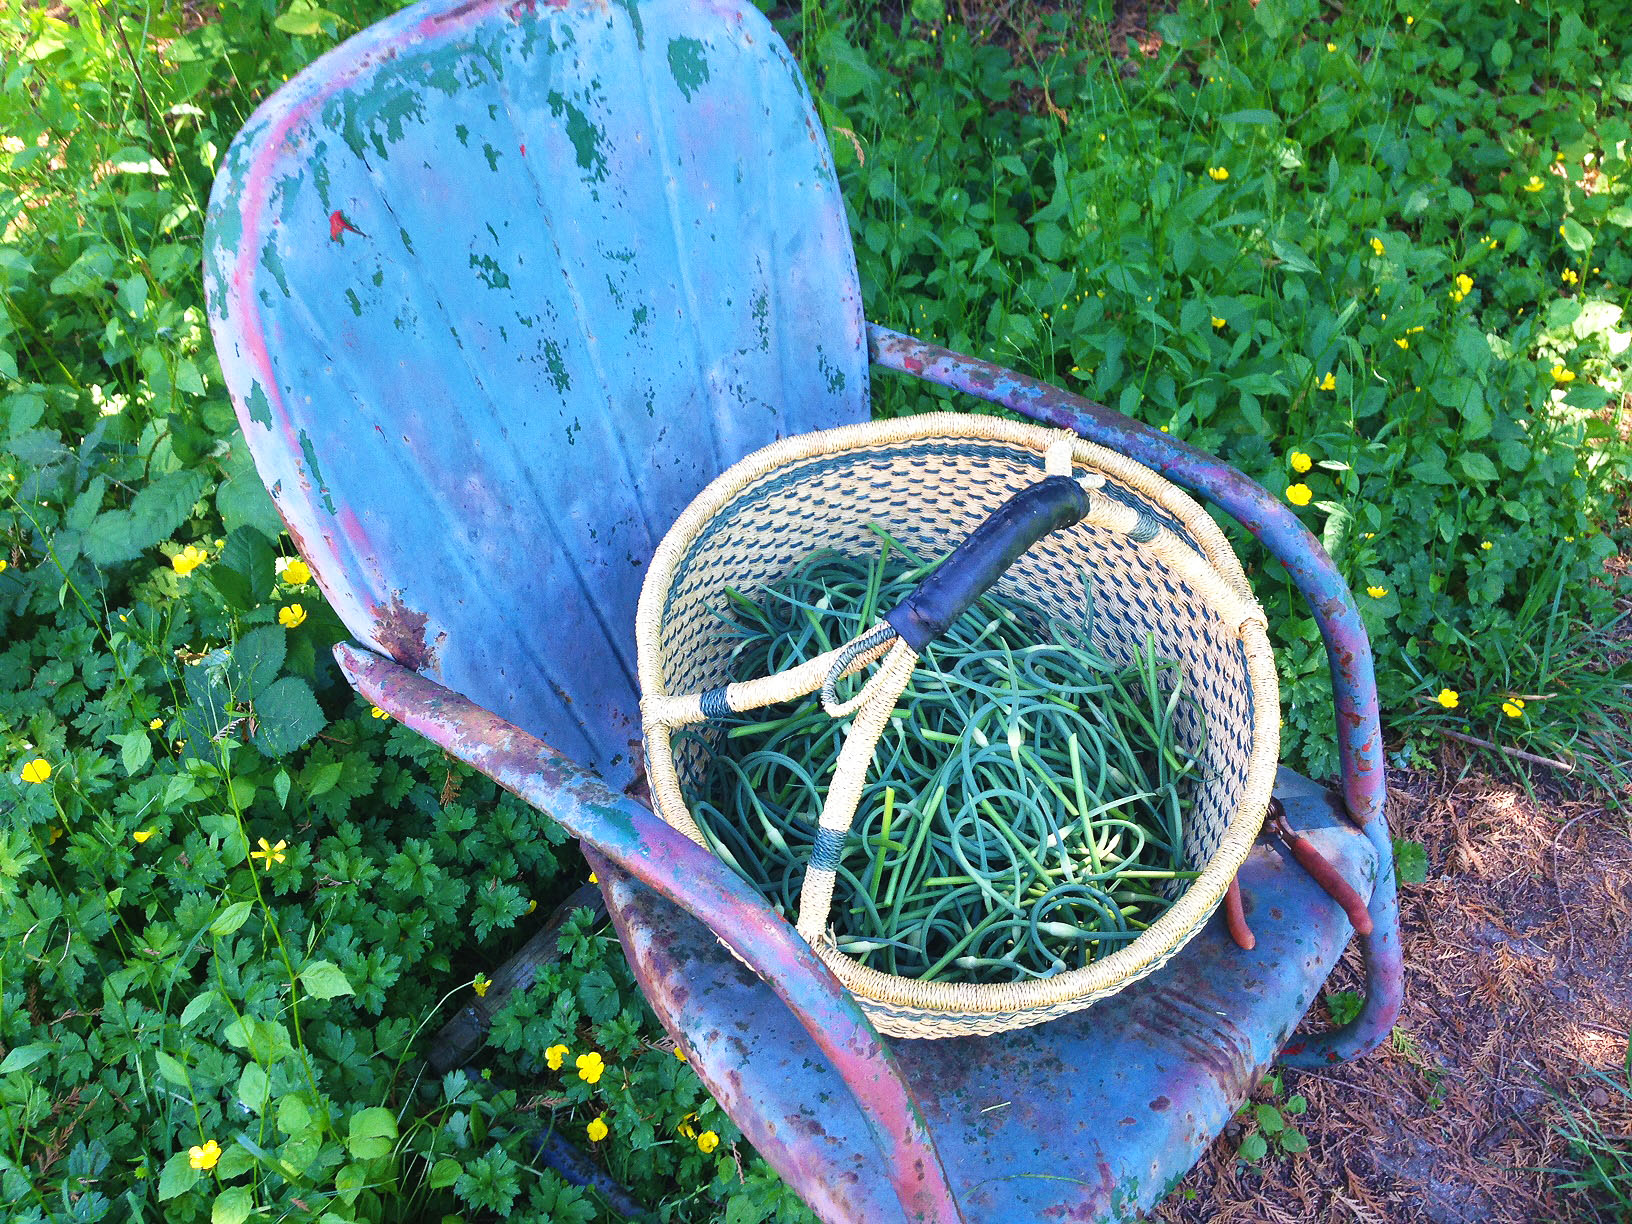 garlic scapes 1 - Freezing Garlic